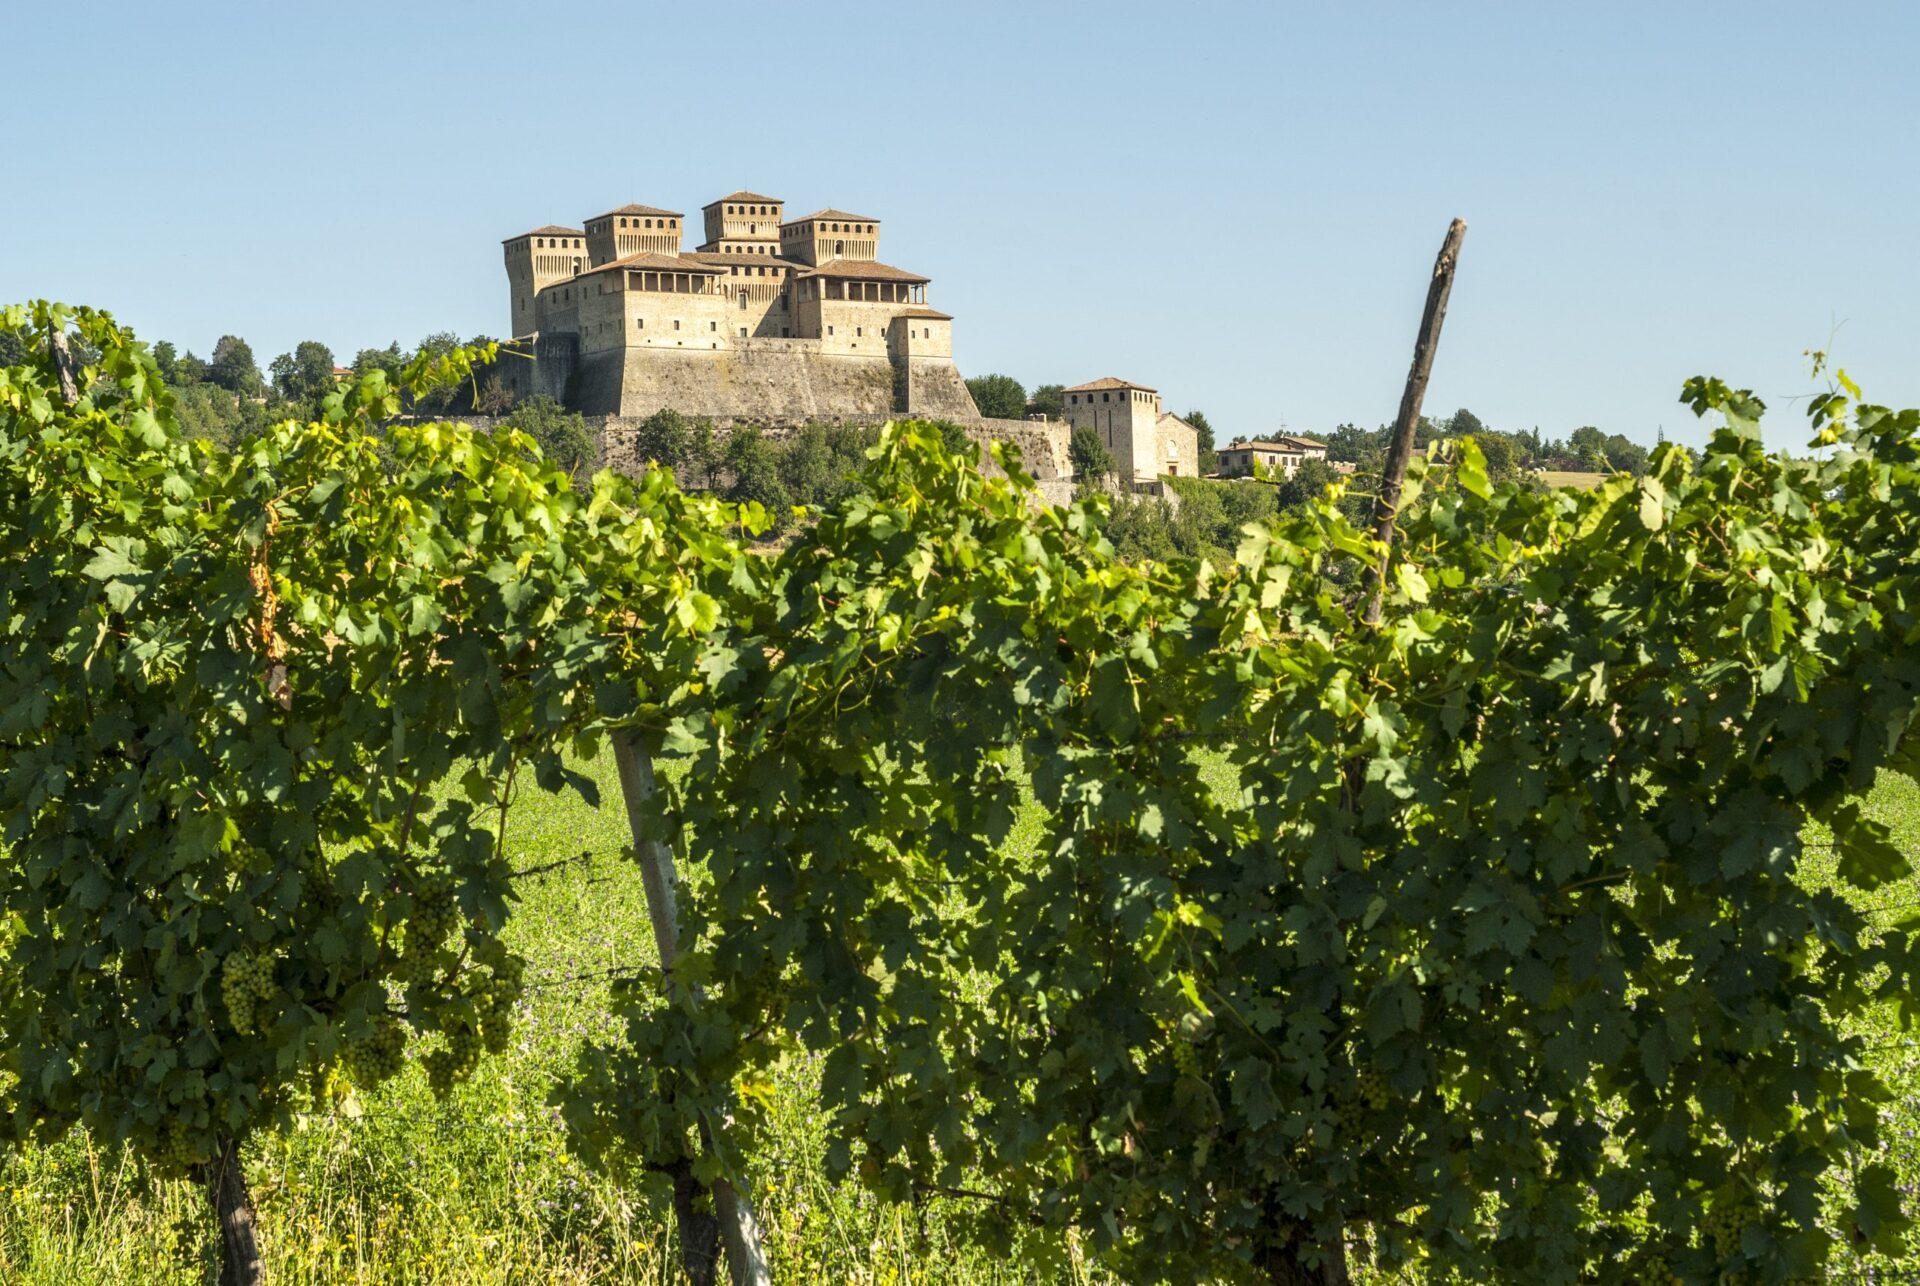 The Castle of Torrechiara and vineyard, Emilia Romagna